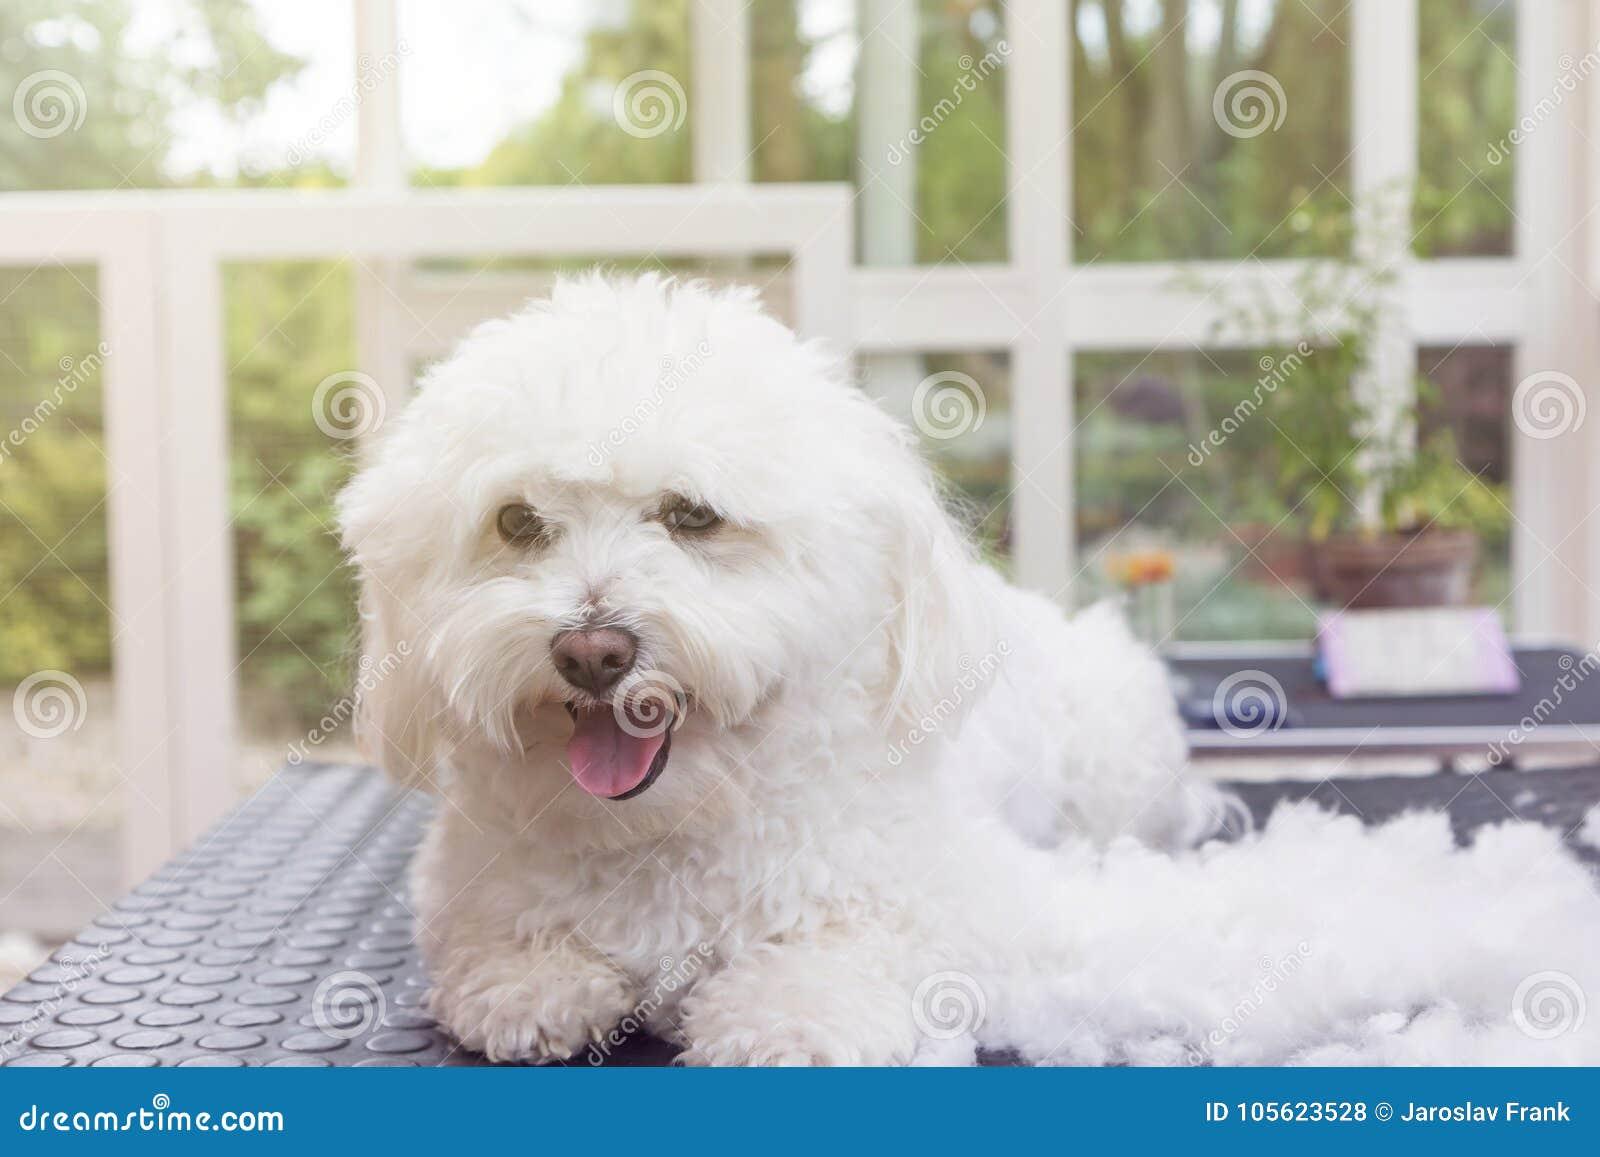 Cute white Bolognese dog is enjoying grooming